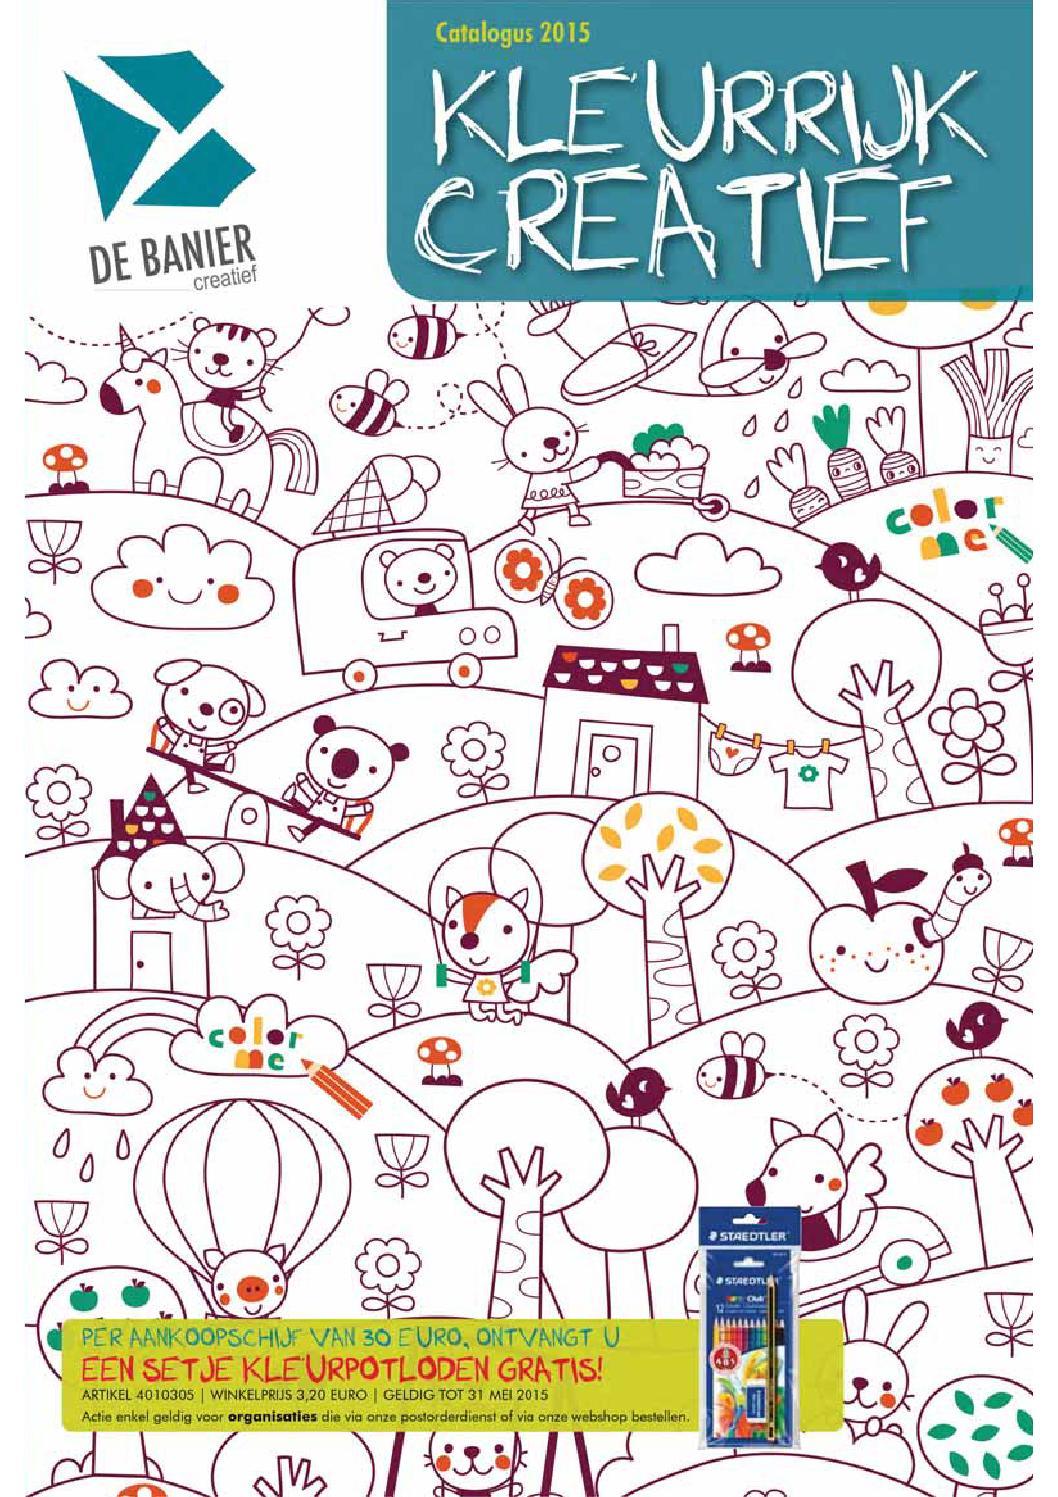 De Banier Catalogus 2015 By Geert Buyse Issuu